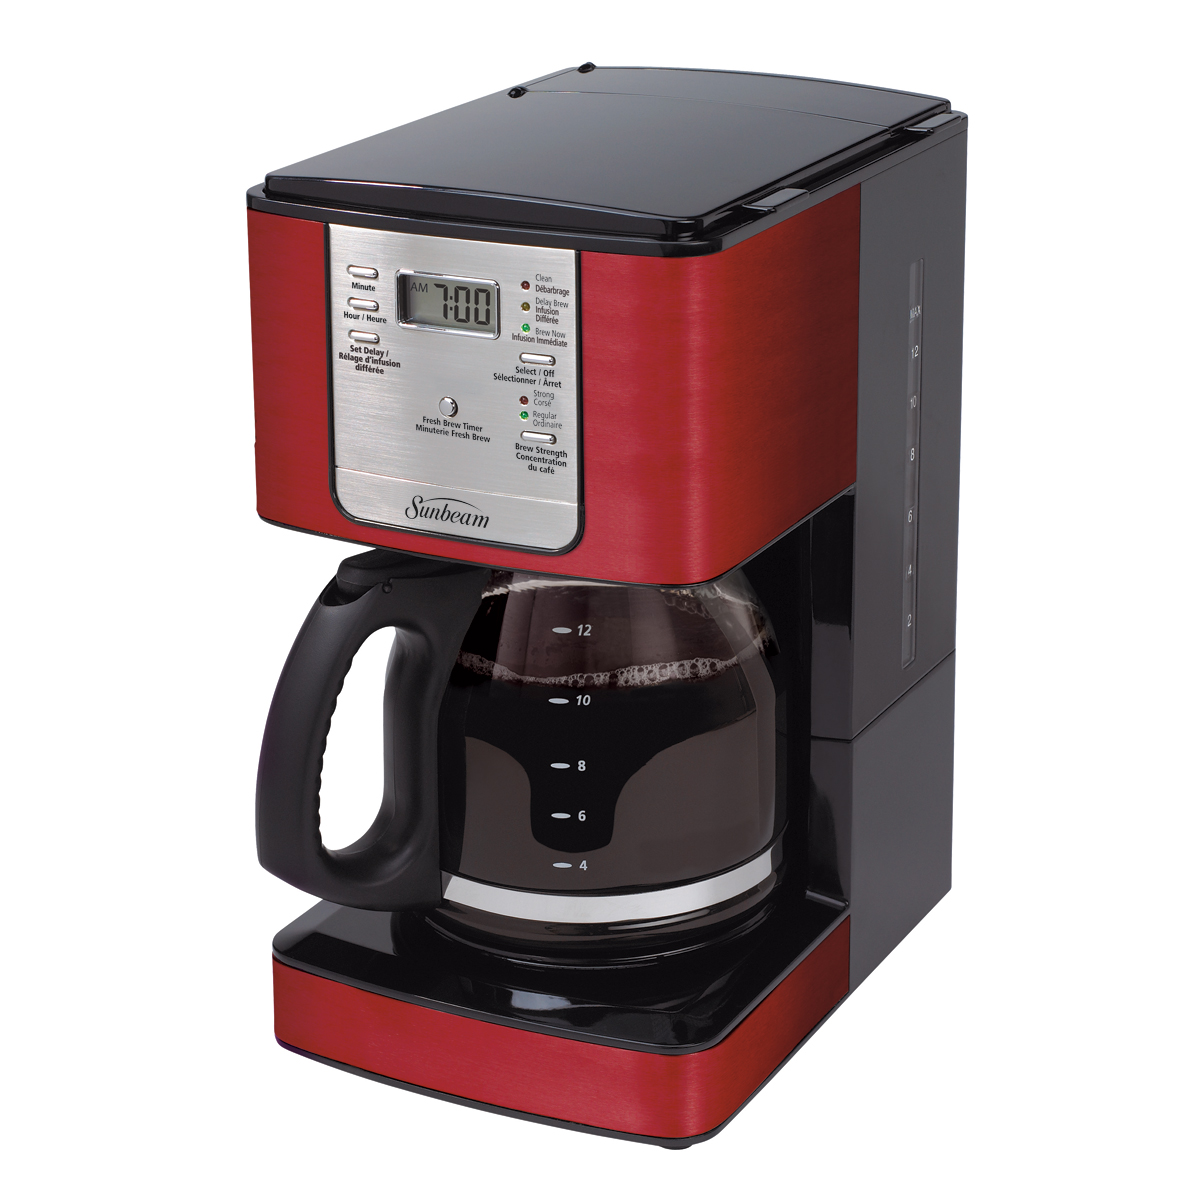 Cafetiere Sunbeam 12 tasses programmable, Rouge BVSBJWX27JR-033 Sunbeam Canada